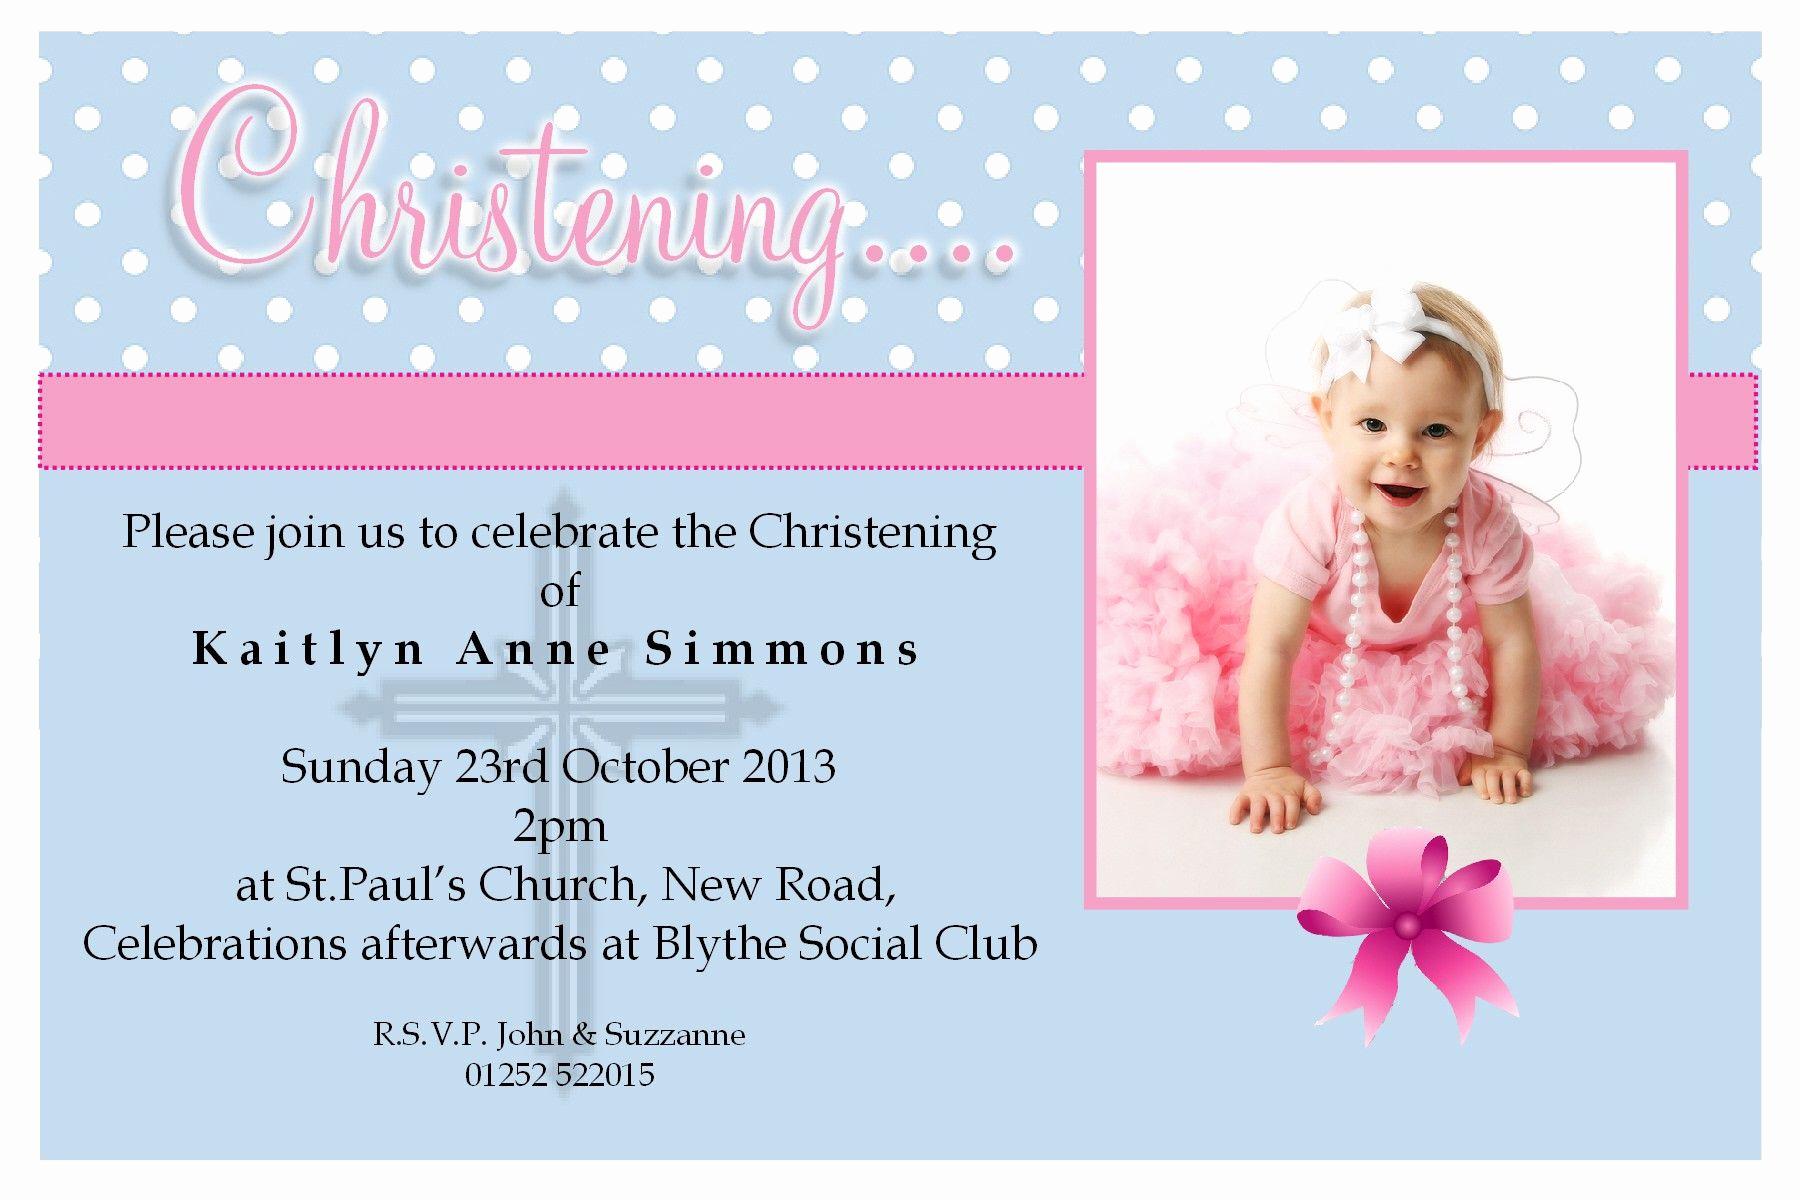 Free Christening Invitation Templates Unique Free Christening Invitation Templates Photoshop